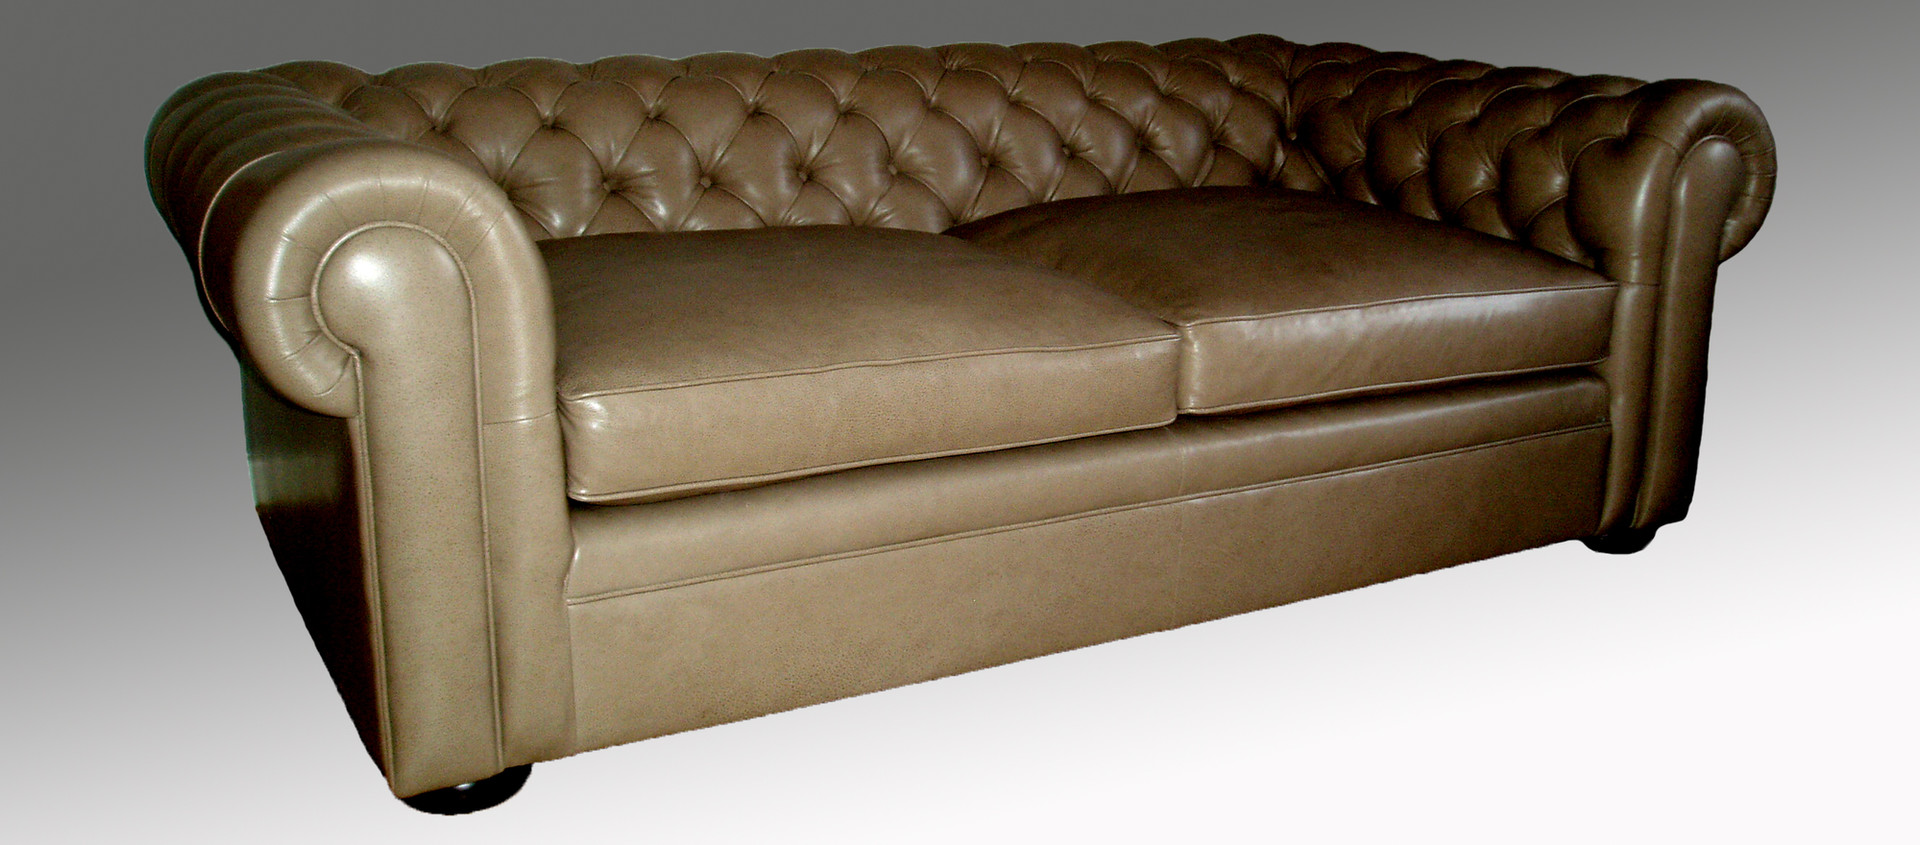 Chesterfield Loose Cushion Sofa